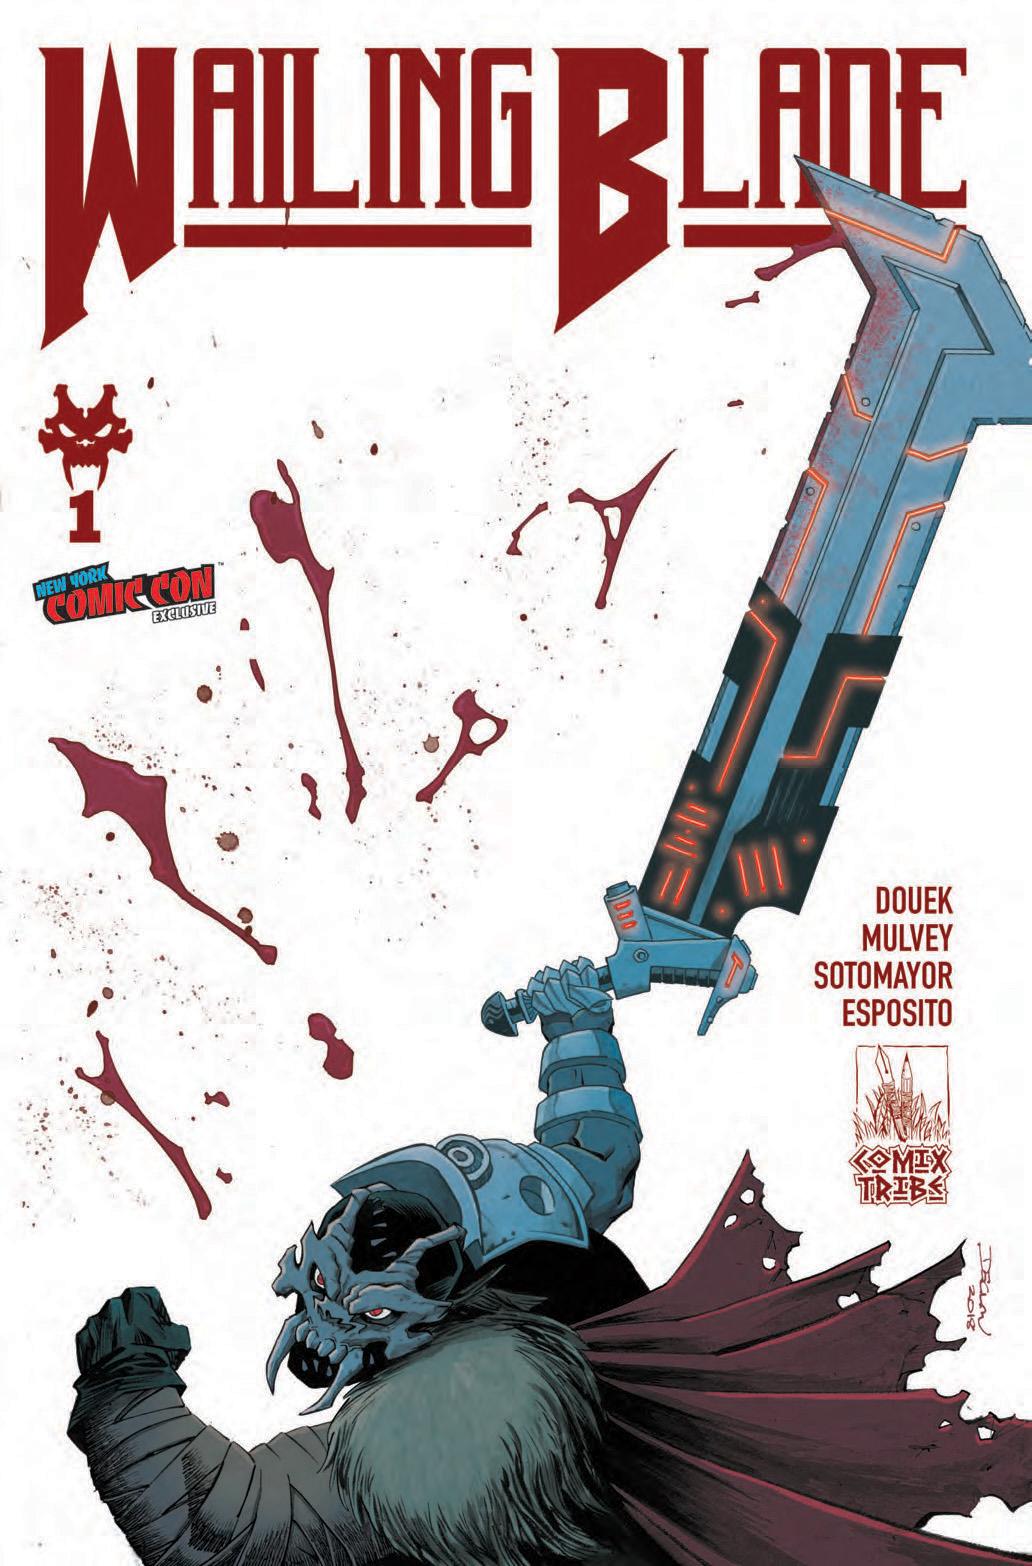 Rich Douek, Wailing Blade #1